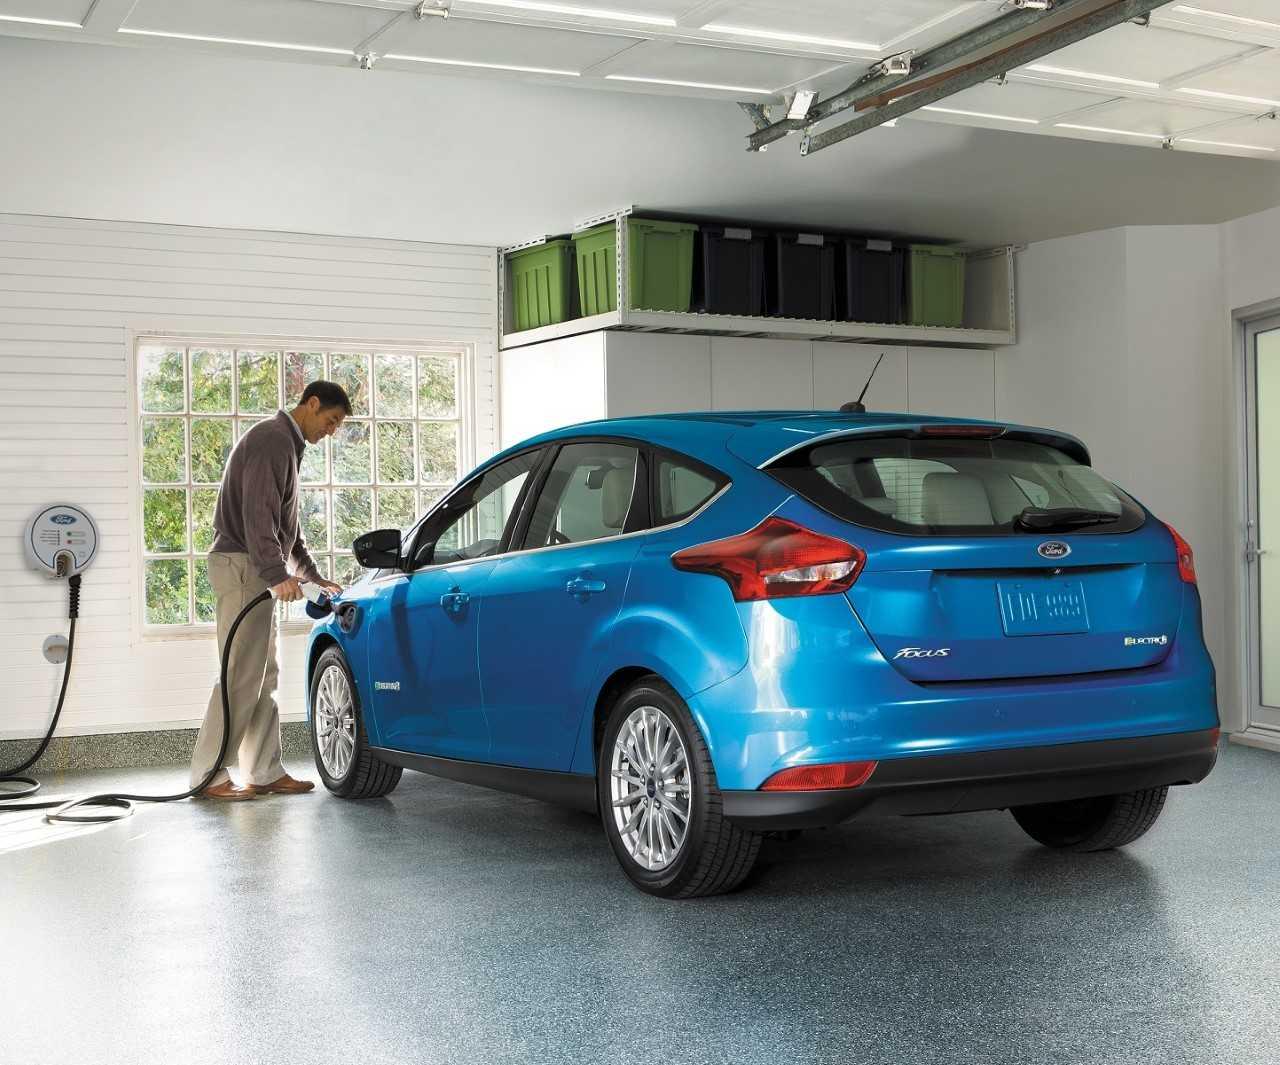 Ford e chineses se unem para carros elétricos